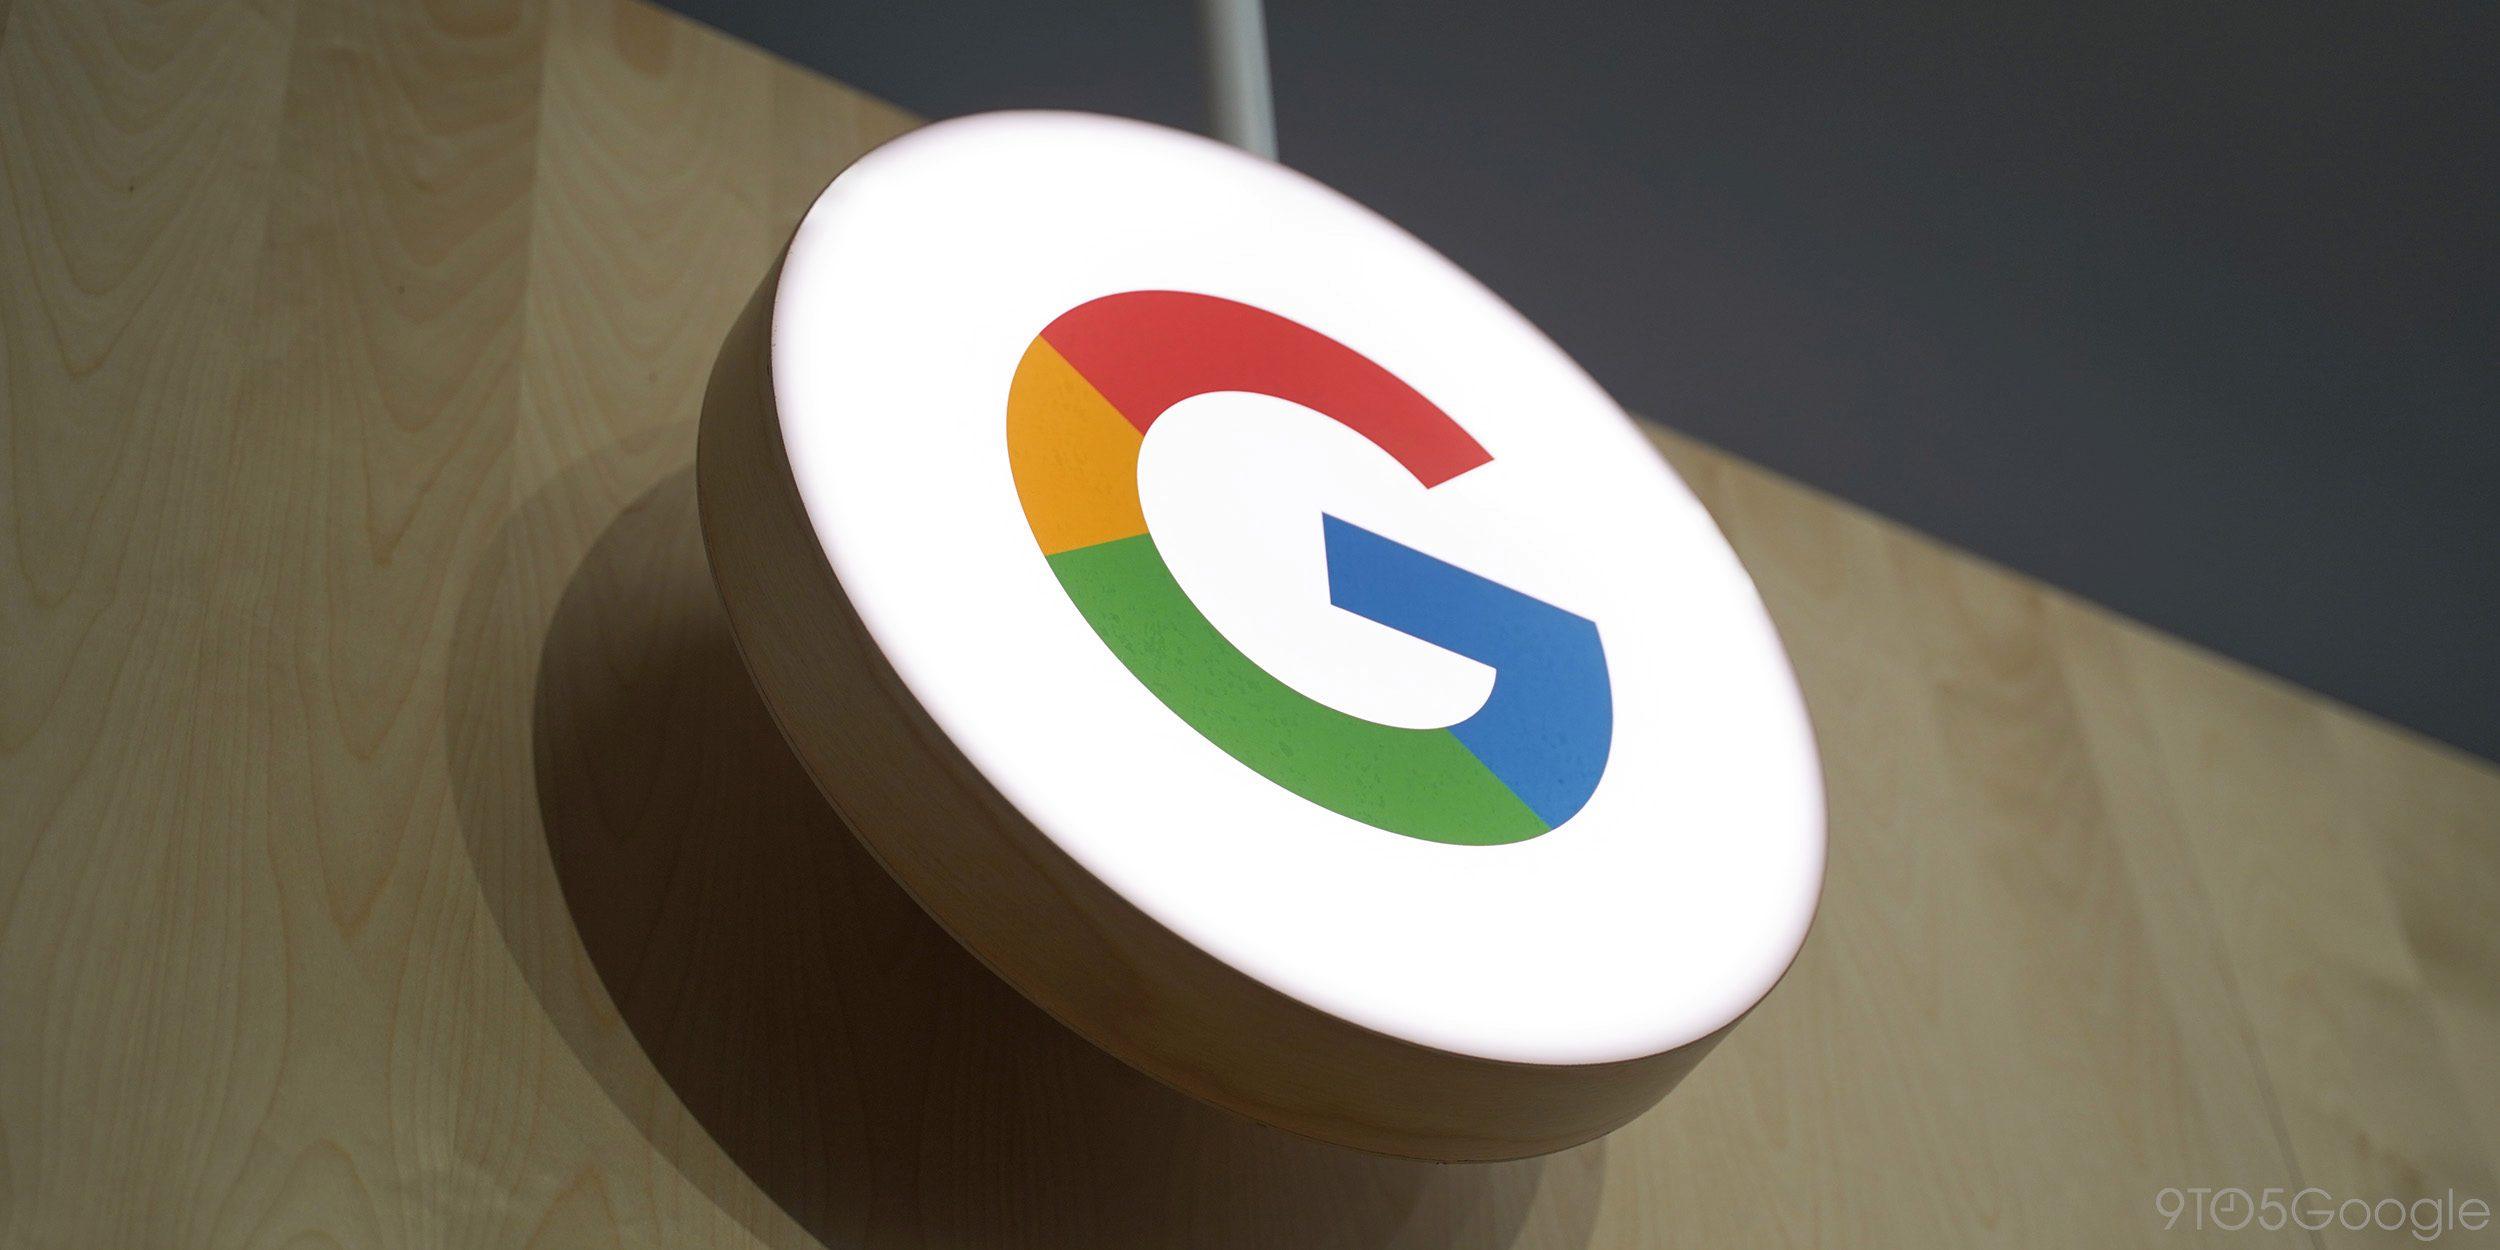 Report: Googler dissatisfaction with leadership growing according to internal survey